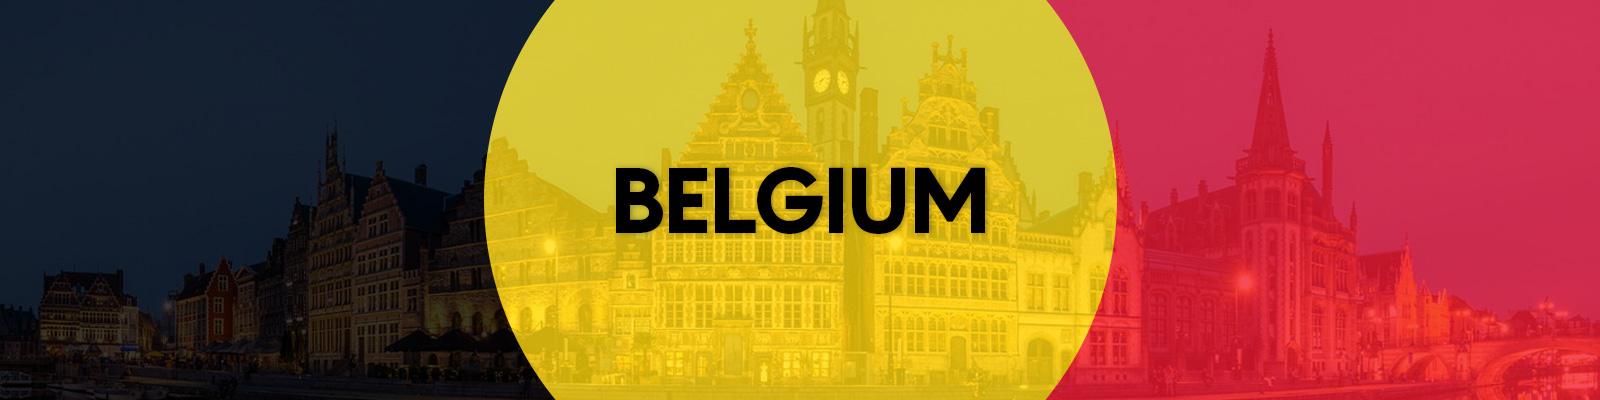 app development companies belgium